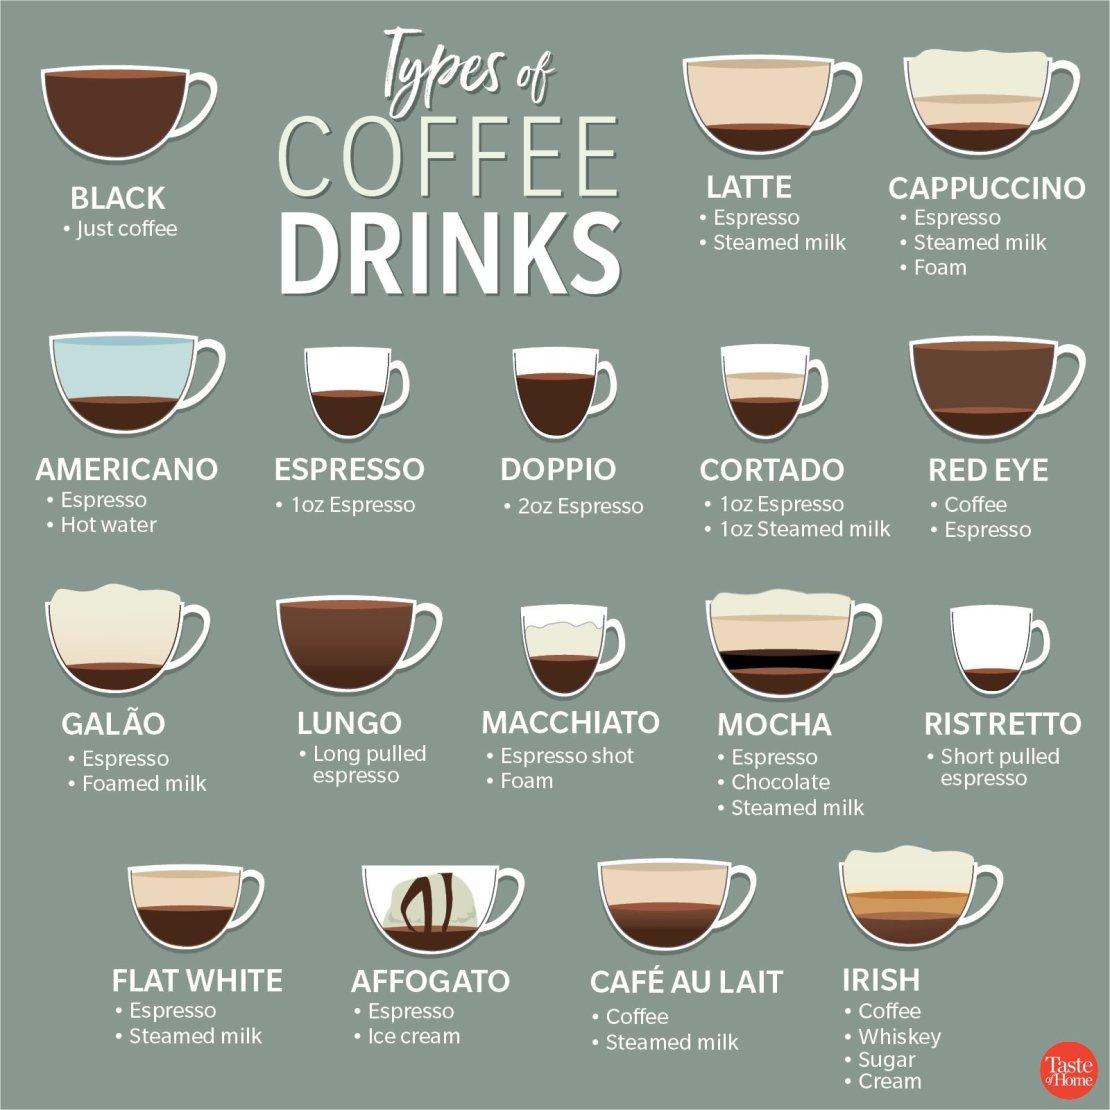 How much is too much caffeine